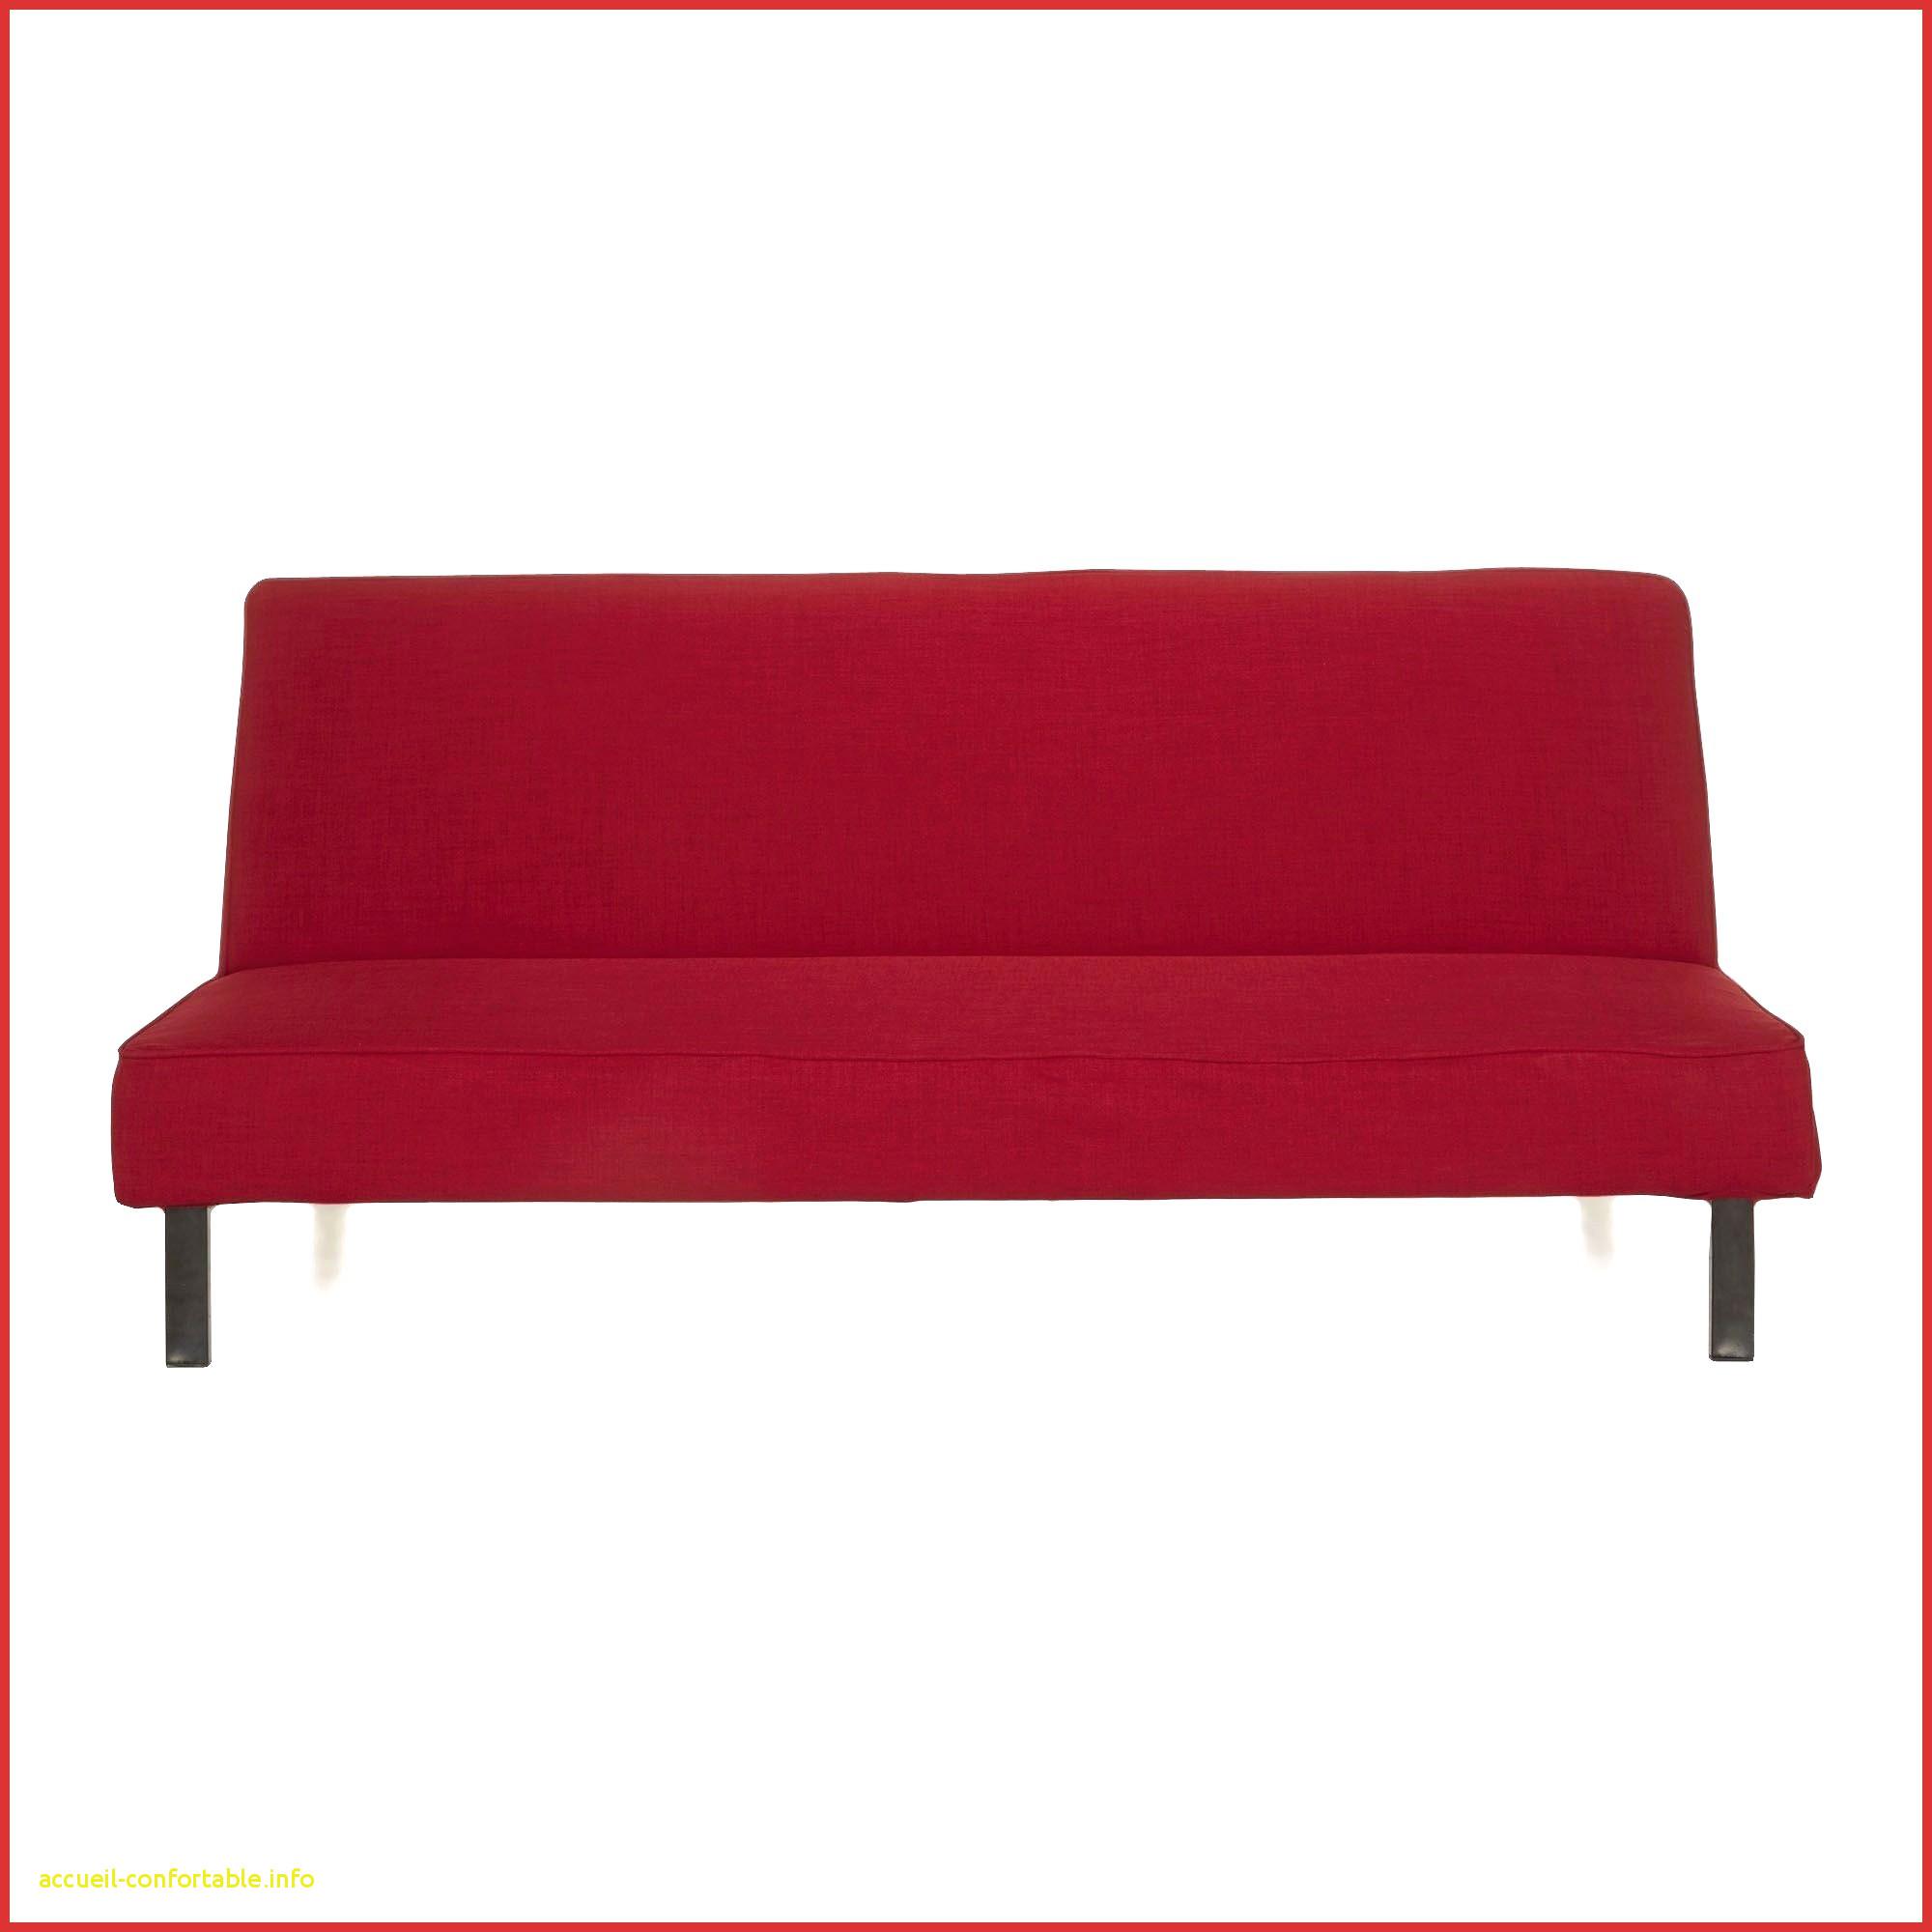 Canapé Convertible Confortable Bultex Inspirant Collection Clic Clac Matelas Bultex Ides